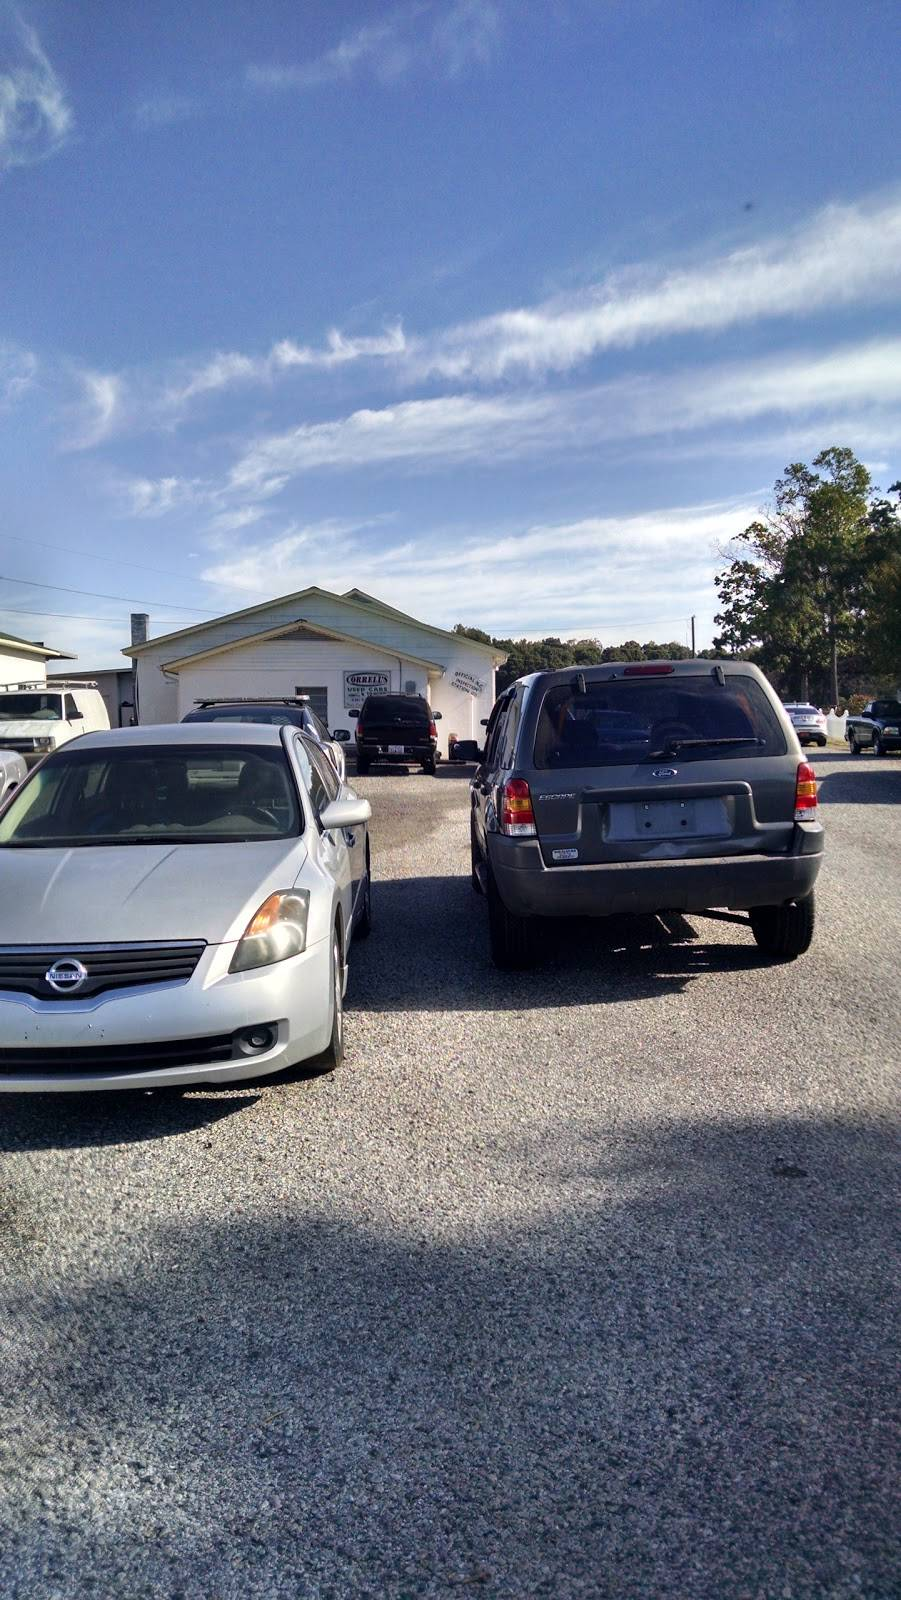 Correll Used Cars - car dealer    Photo 1 of 2   Address: 2887 US-601, Mocksville, NC 27028, USA   Phone: (336) 284-2080